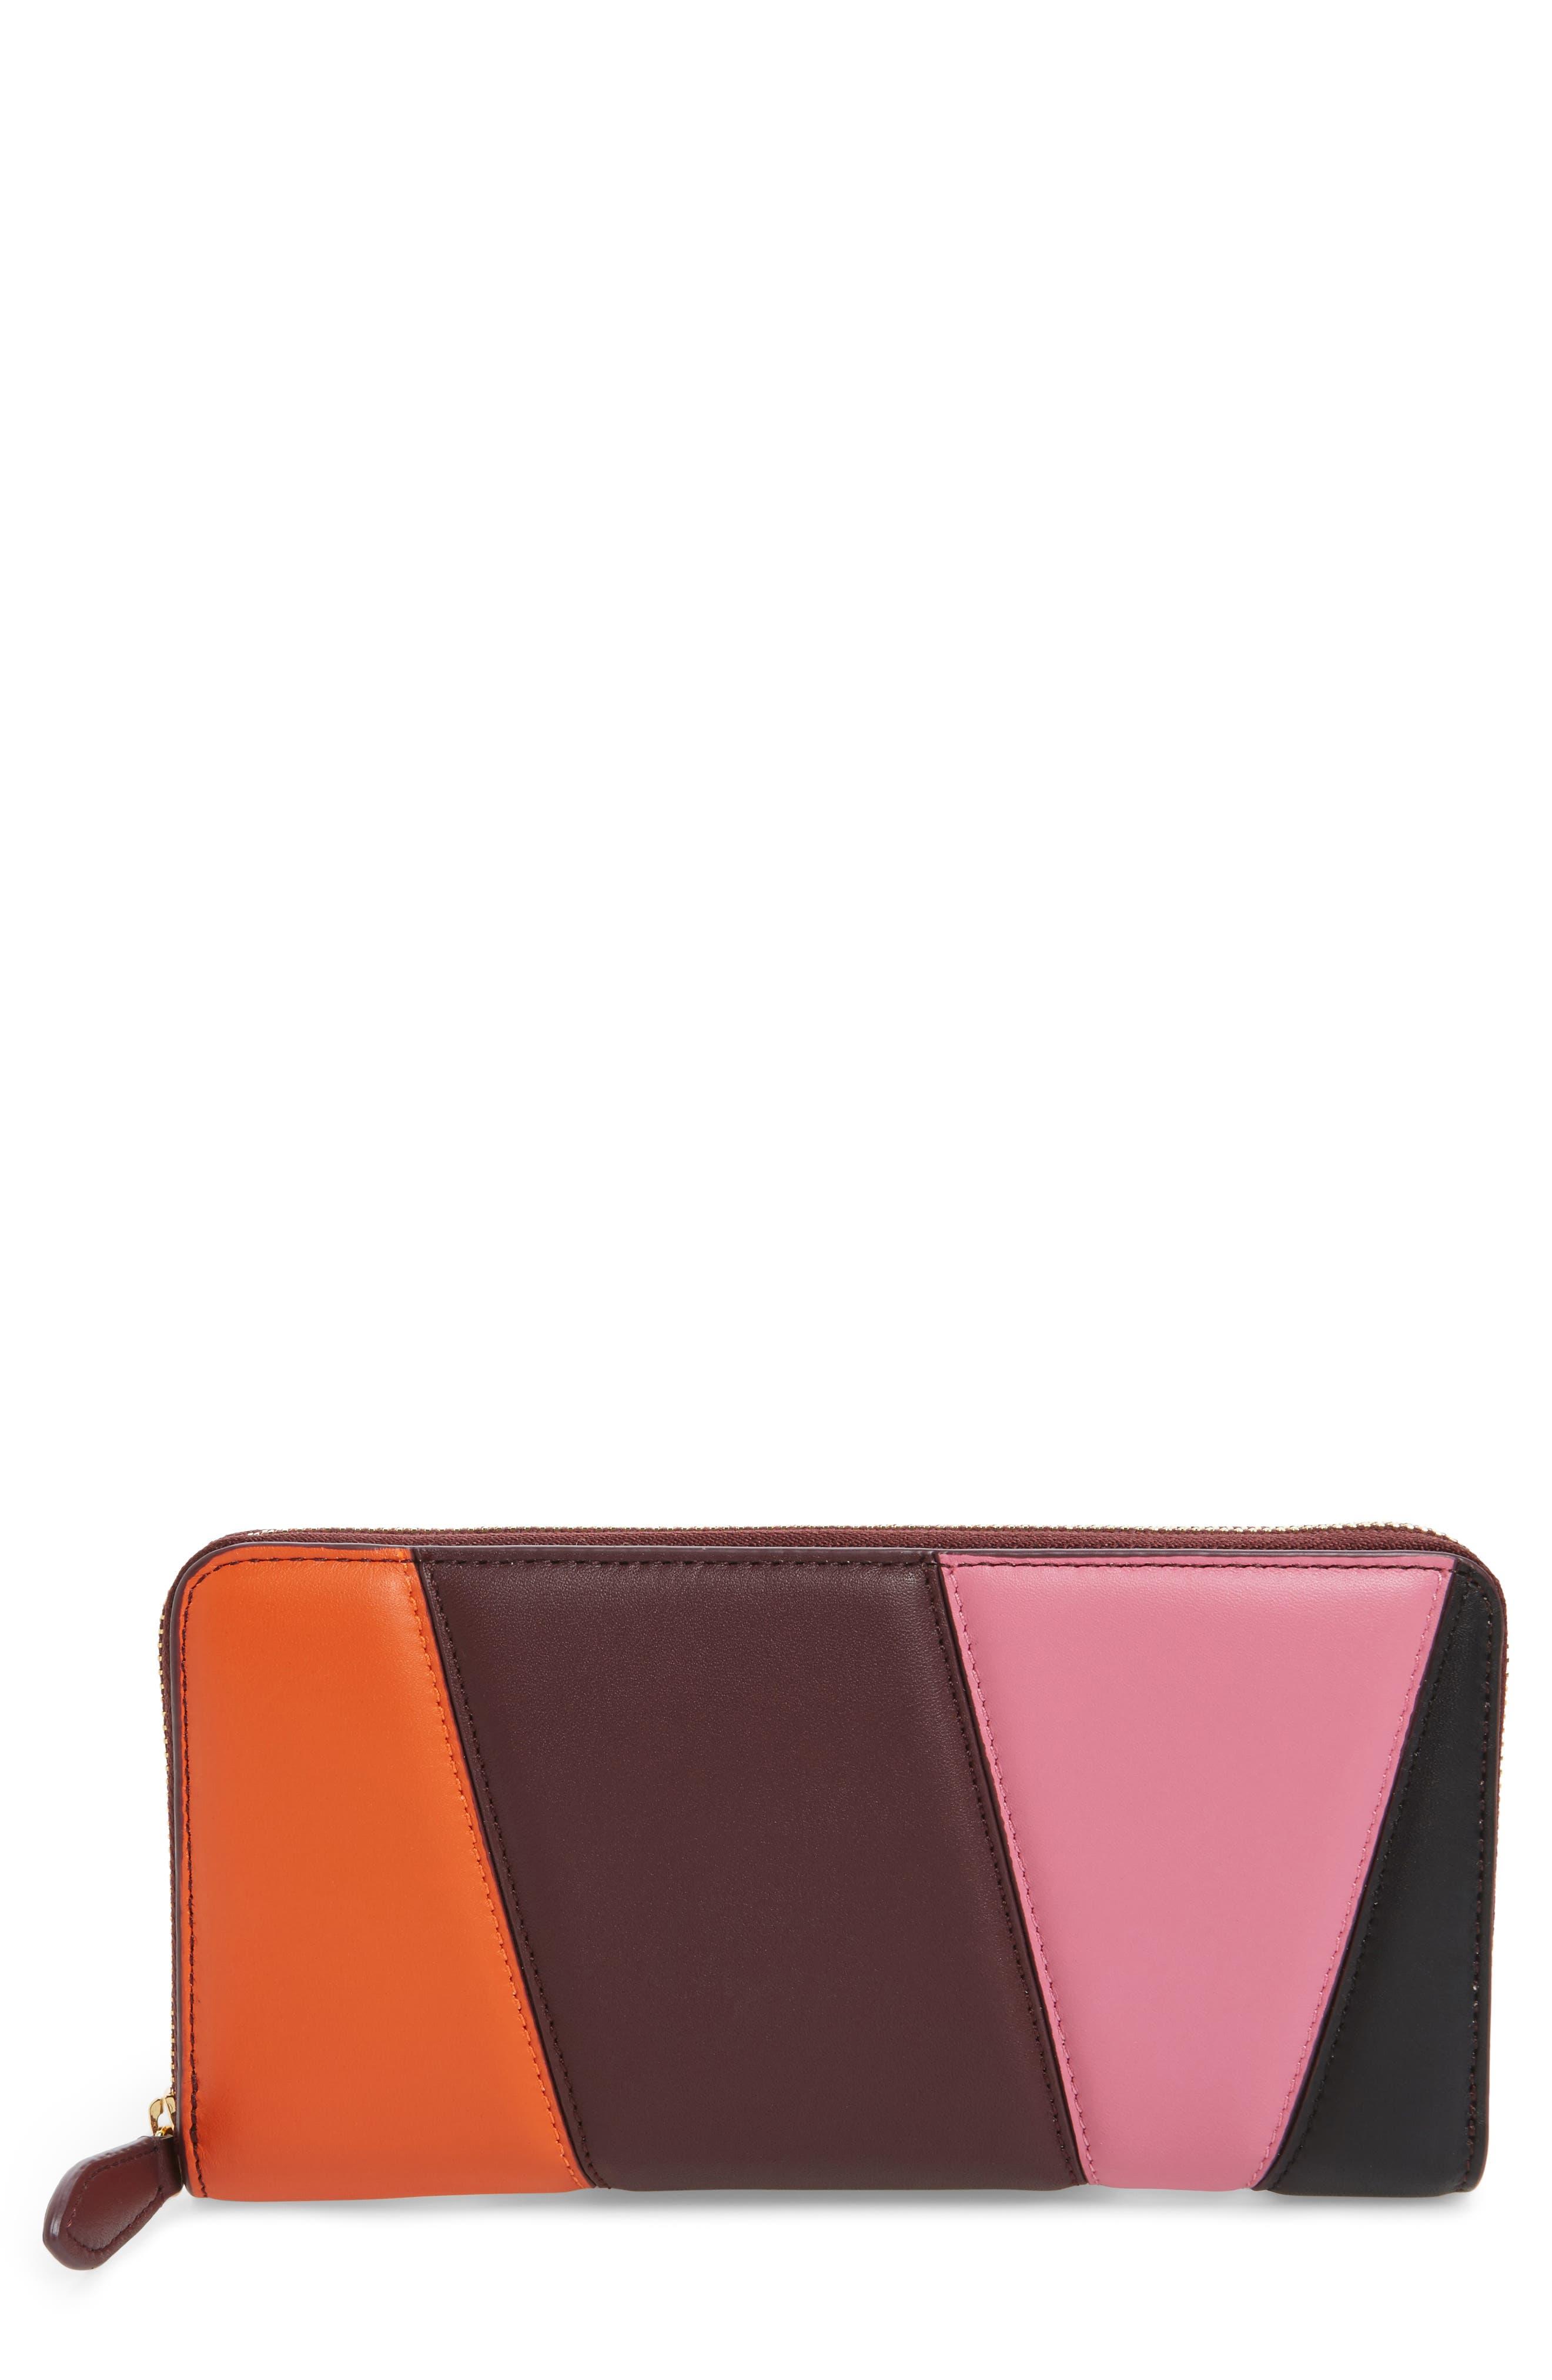 Alternate Image 1 Selected - Diane von Furstenberg Colorblock Leather Continental Wallet